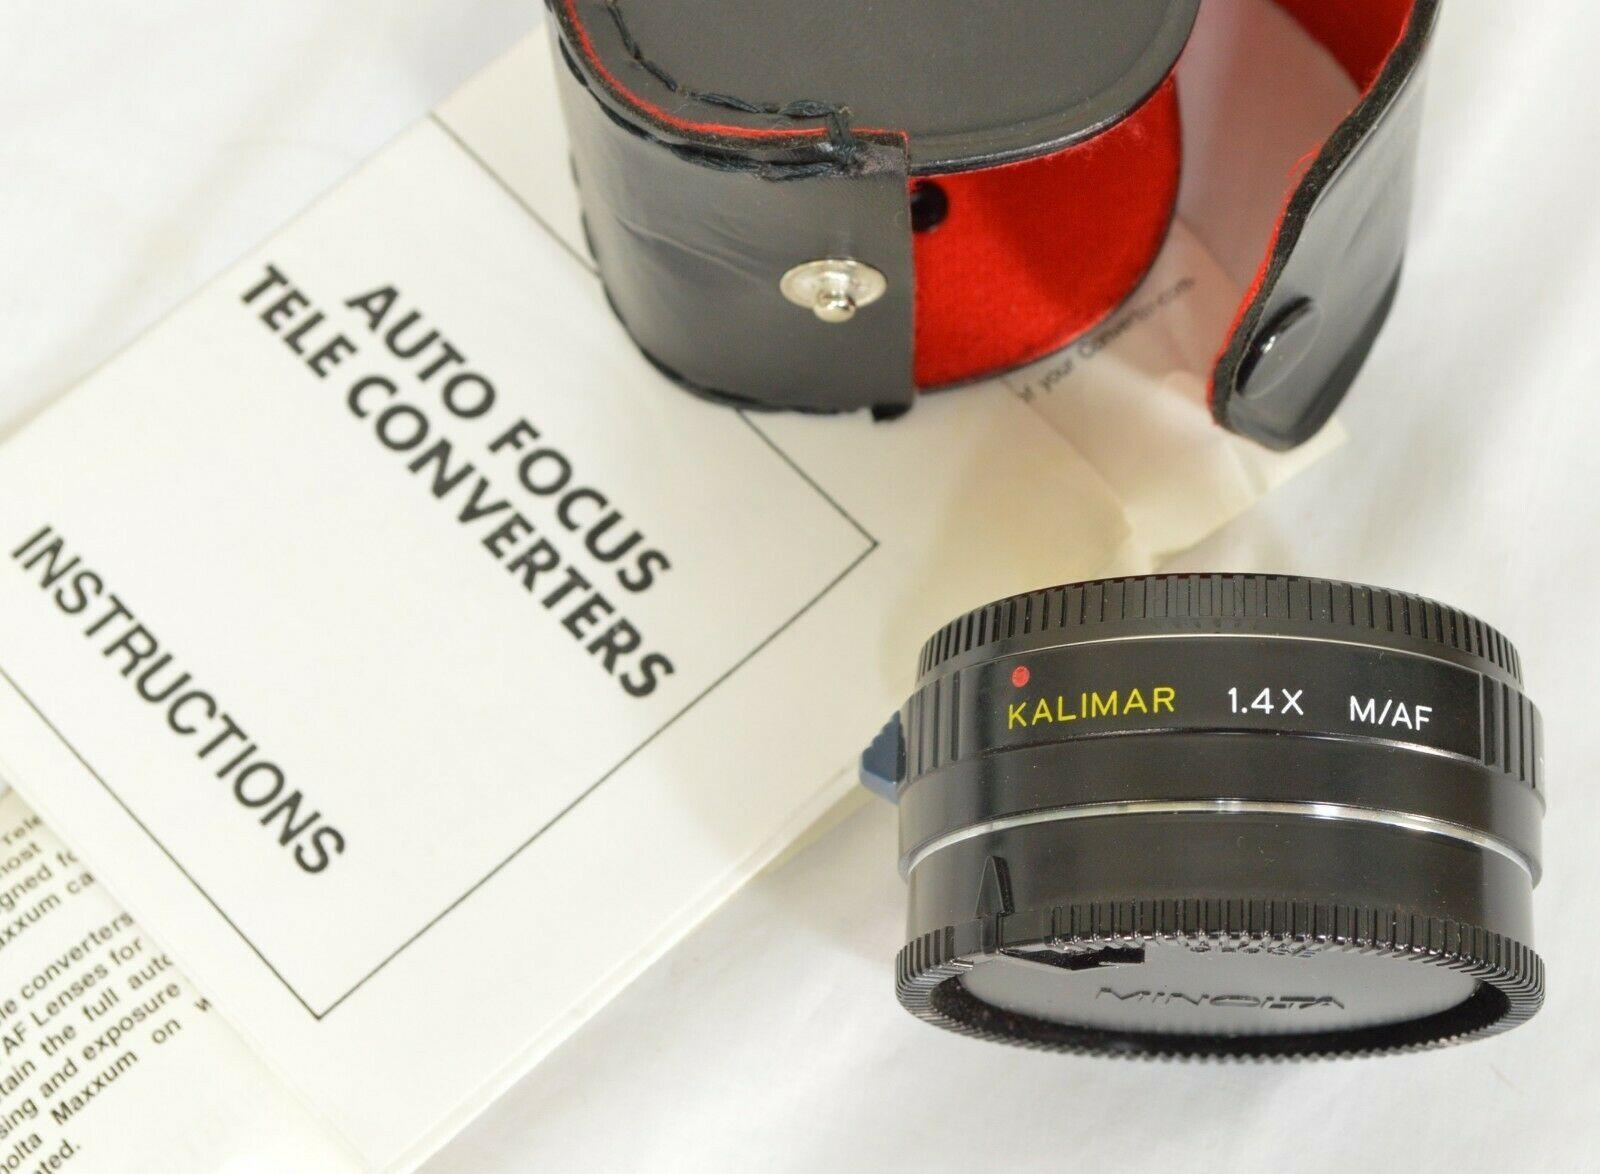 Kalimar 1.4 X M/AF Tele Converter Auto Focus camera lens w/ case & instructions image 11